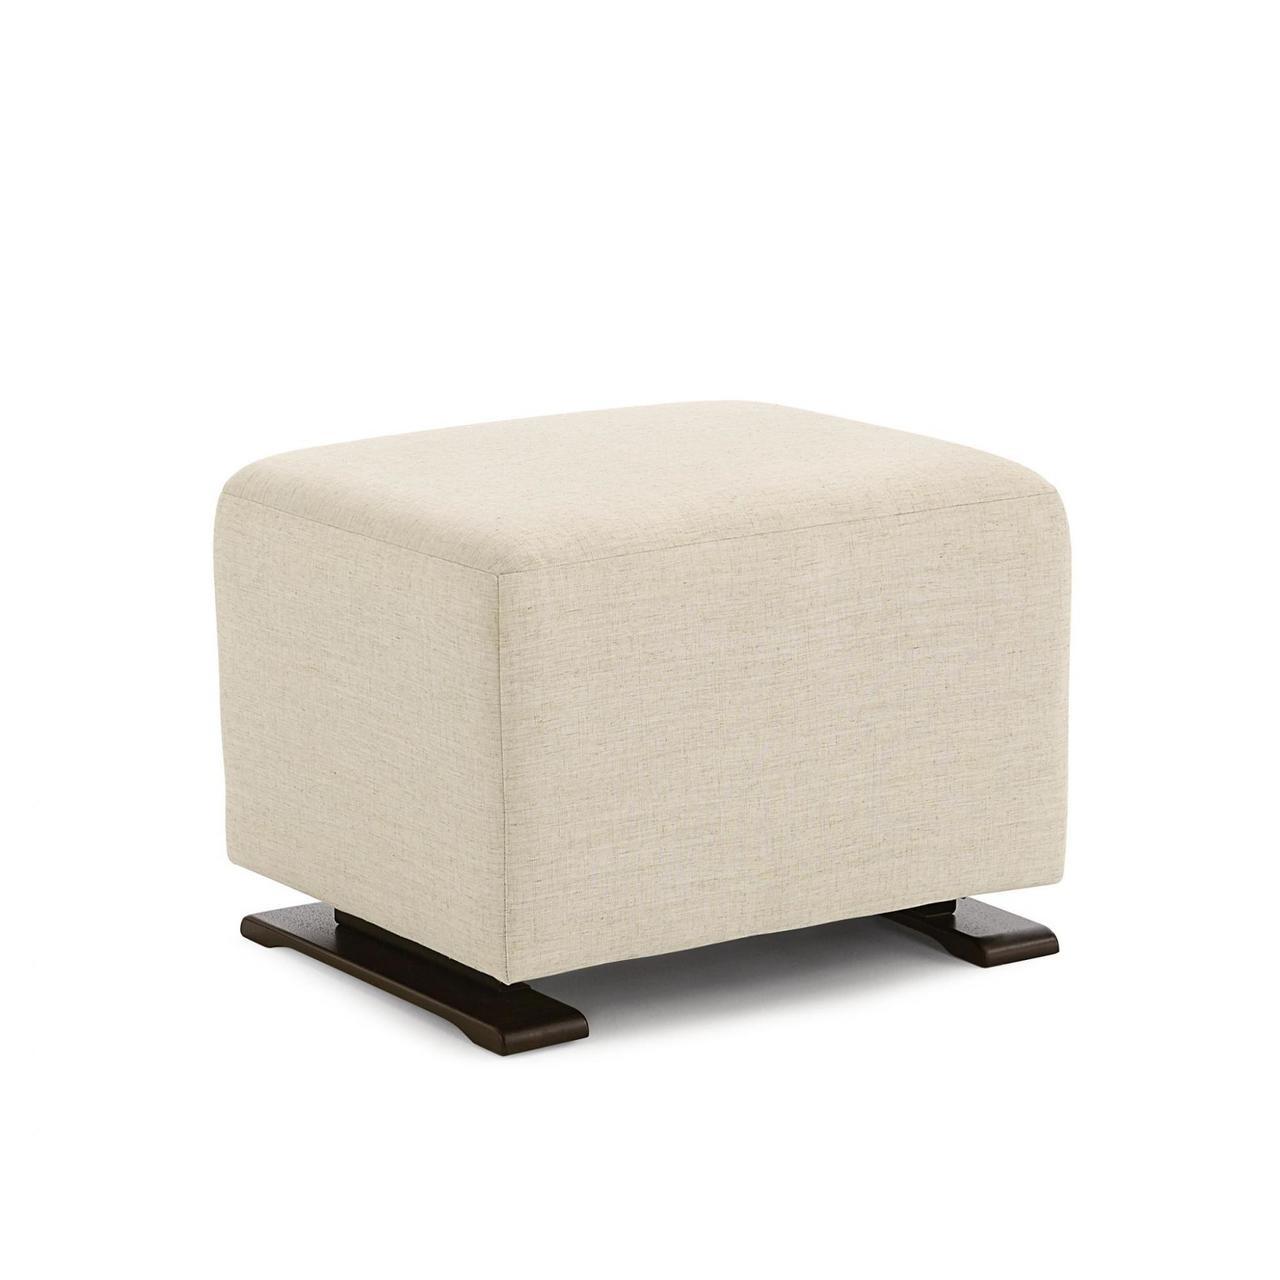 Enjoyable Best Chairs 0006 Glide Ottoman Ibusinesslaw Wood Chair Design Ideas Ibusinesslaworg